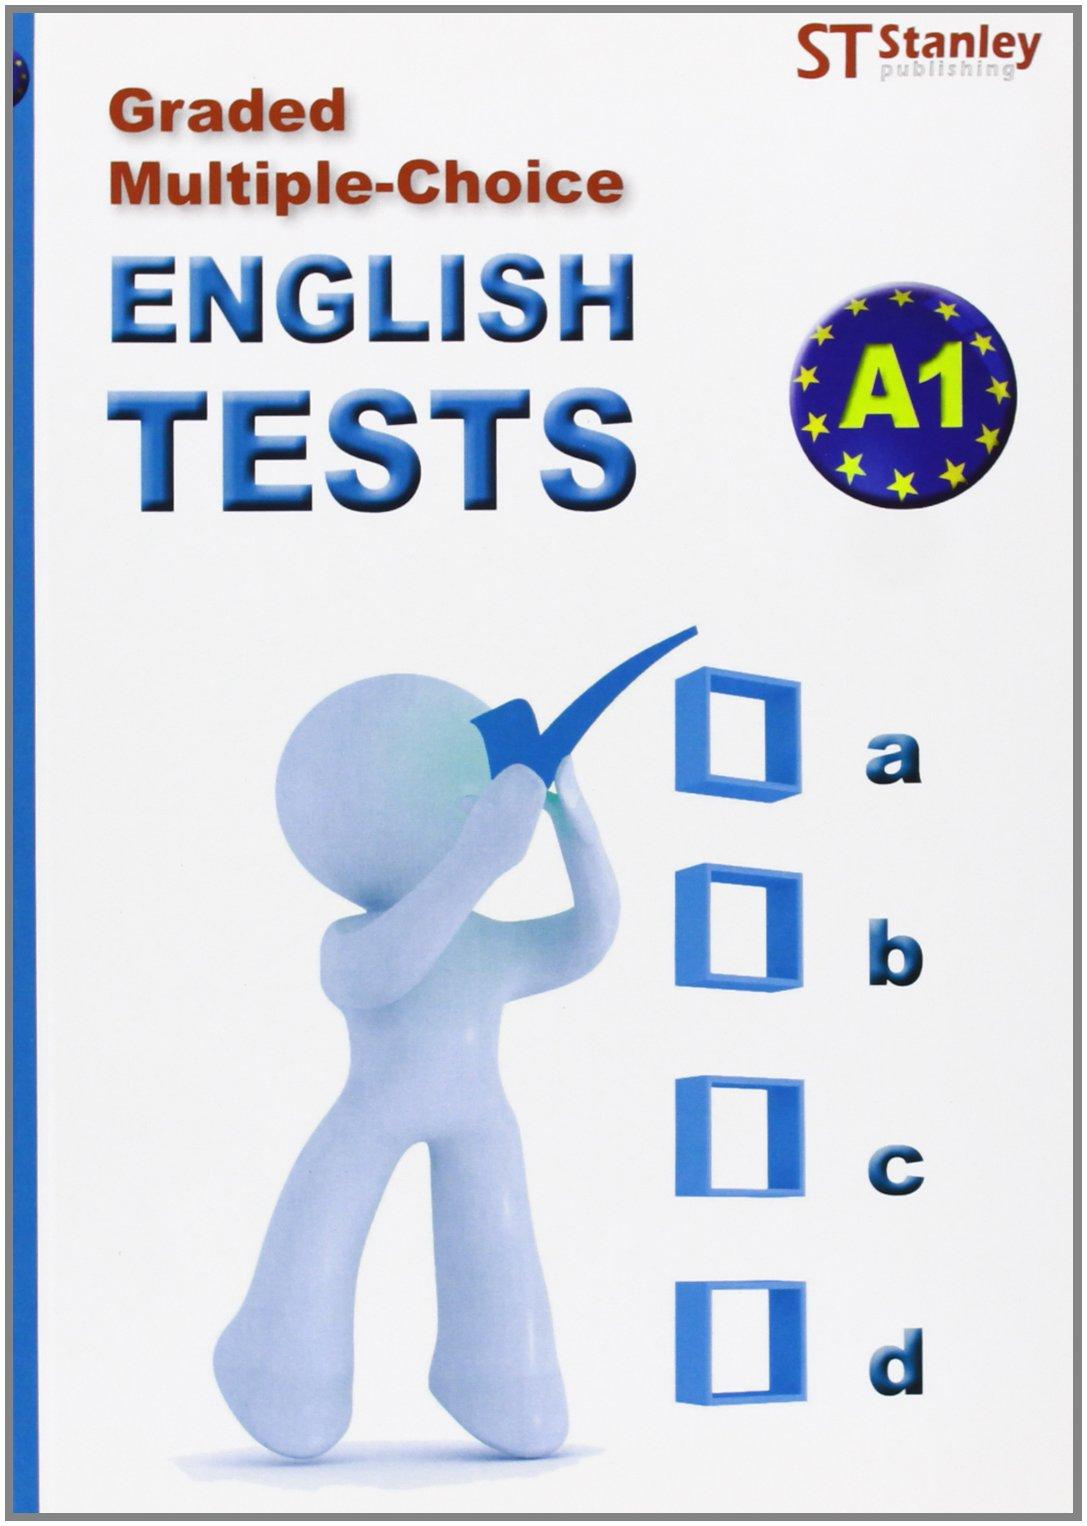 Graded multiple-choice: English tests-A1 (Inglés) Tapa blanda – 15 abr 2010 Glenn Darragh Editorial Stanley 847873497X LENGUAS